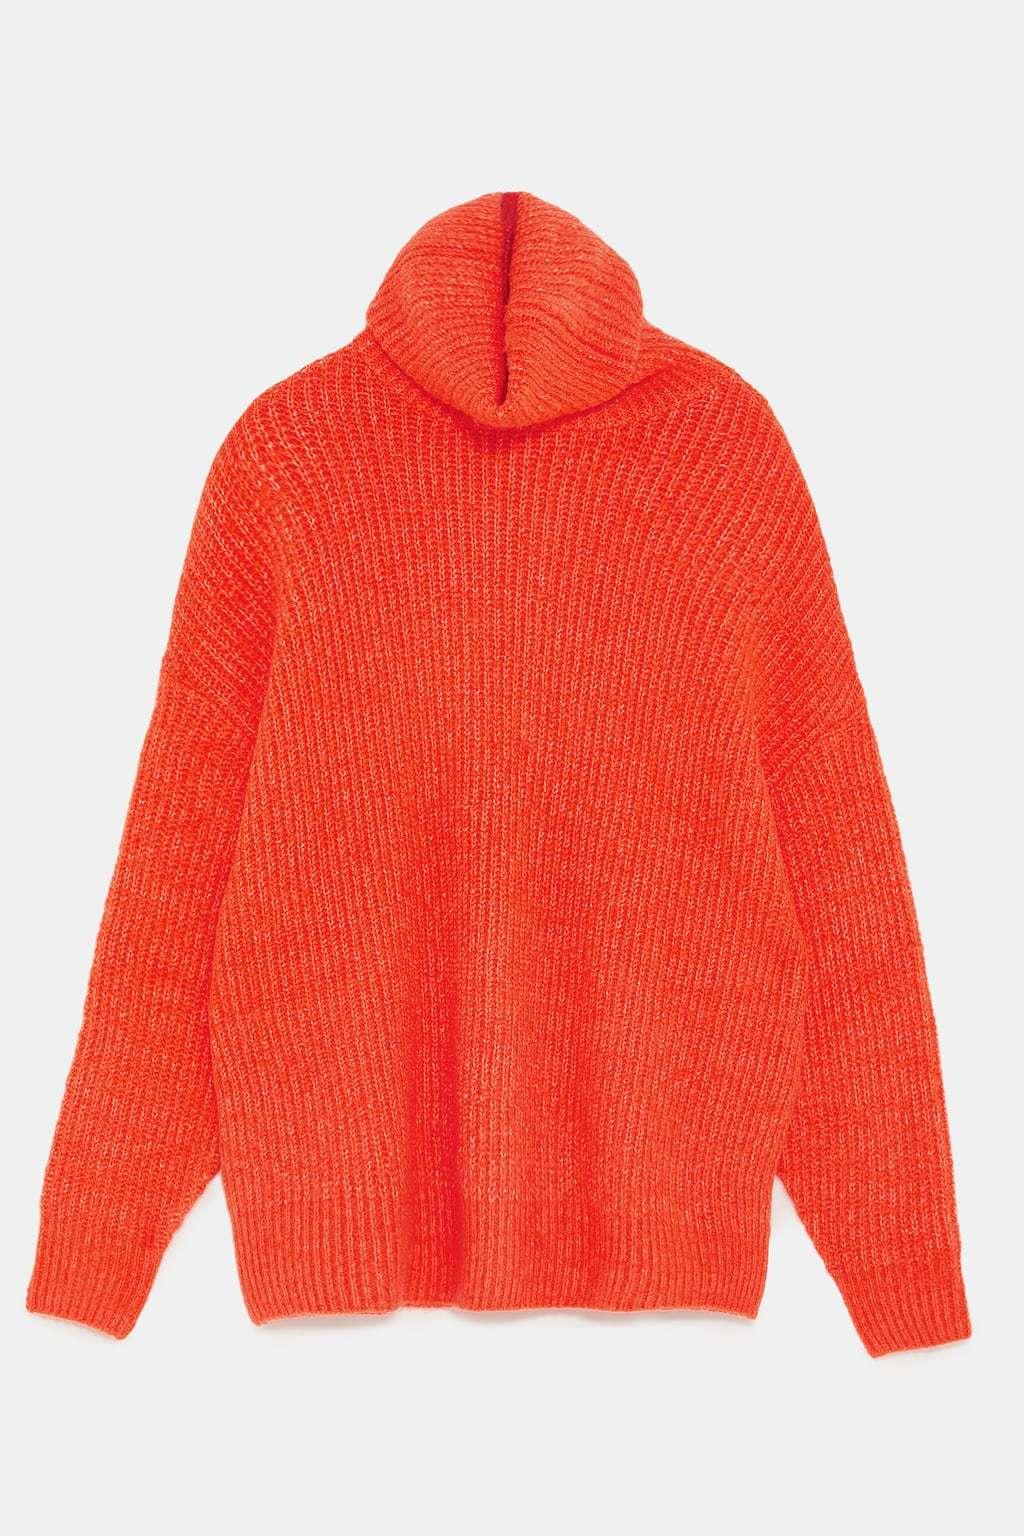 Maxi jersey en naranja flúor de Zara. (29,99 euros)